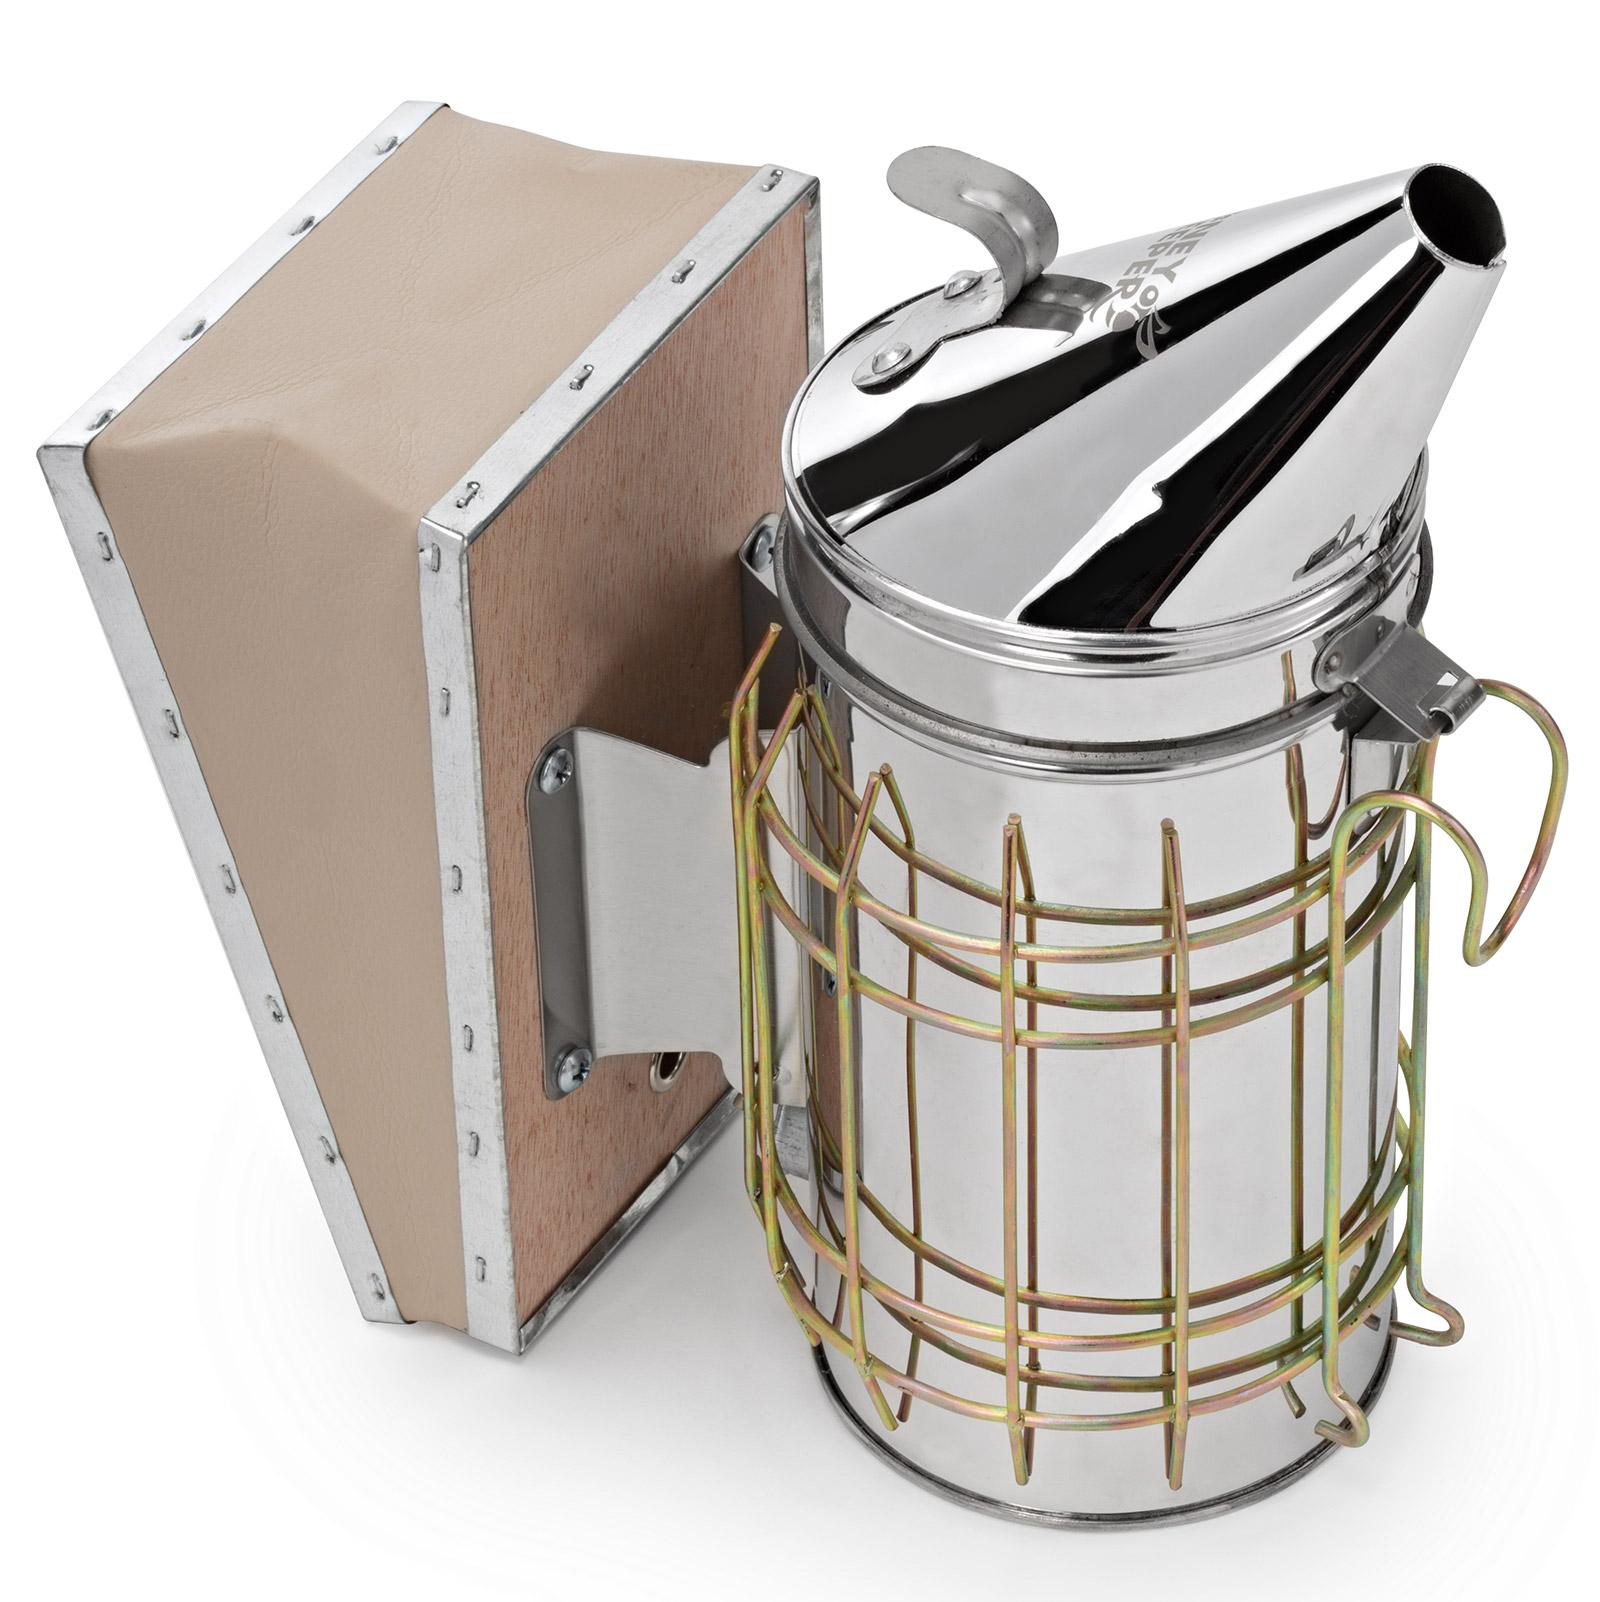 Honey Keeper Bee Hive Smoker Stainless Steel with Heat Shield Beekeeping Beehive Equipment